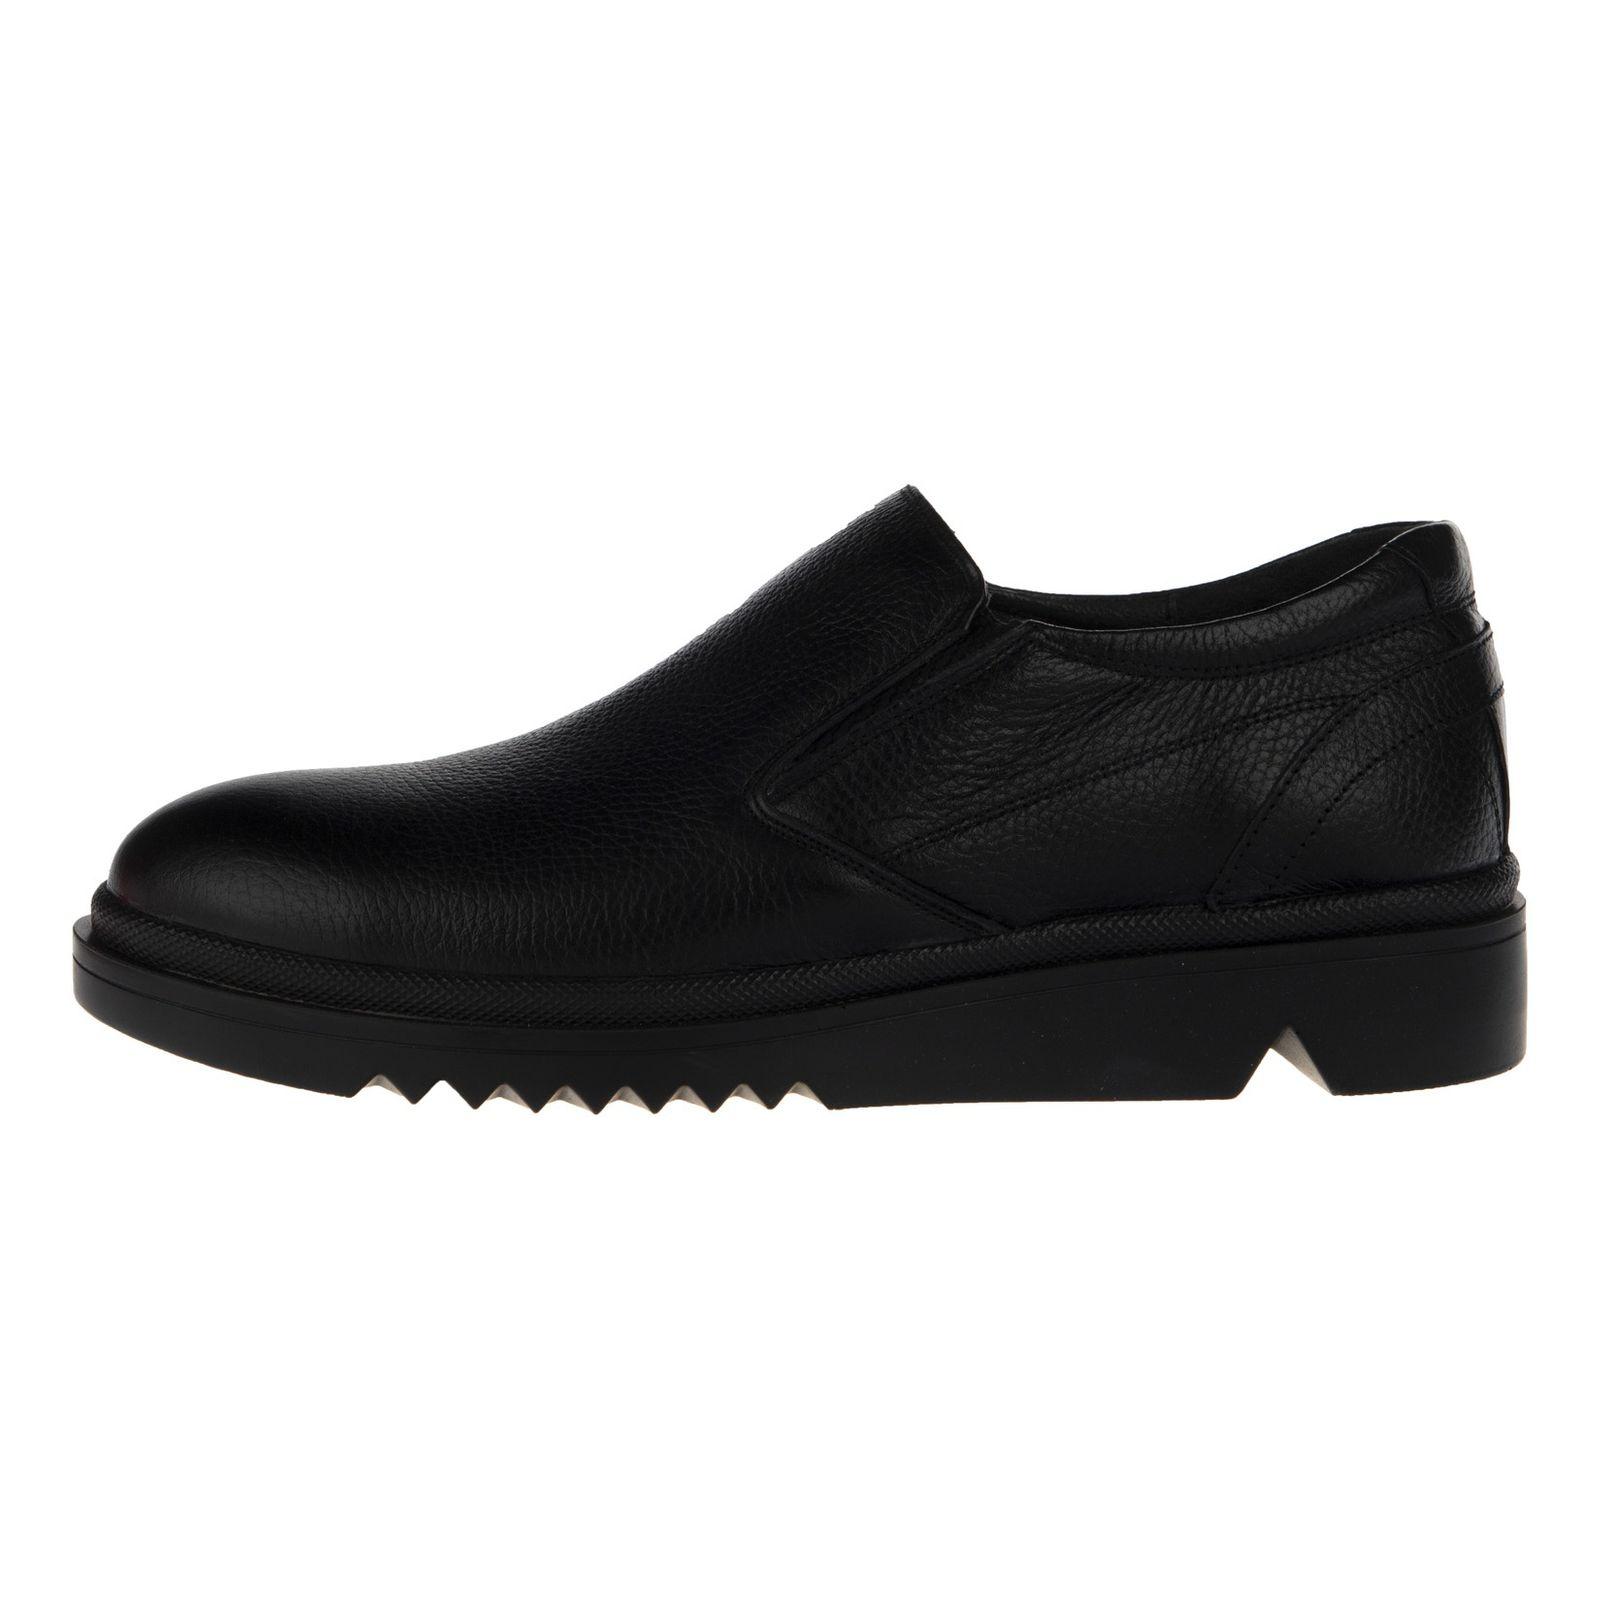 کفش روزمره مردانه شیفر مدل 7160A-101 -  - 3